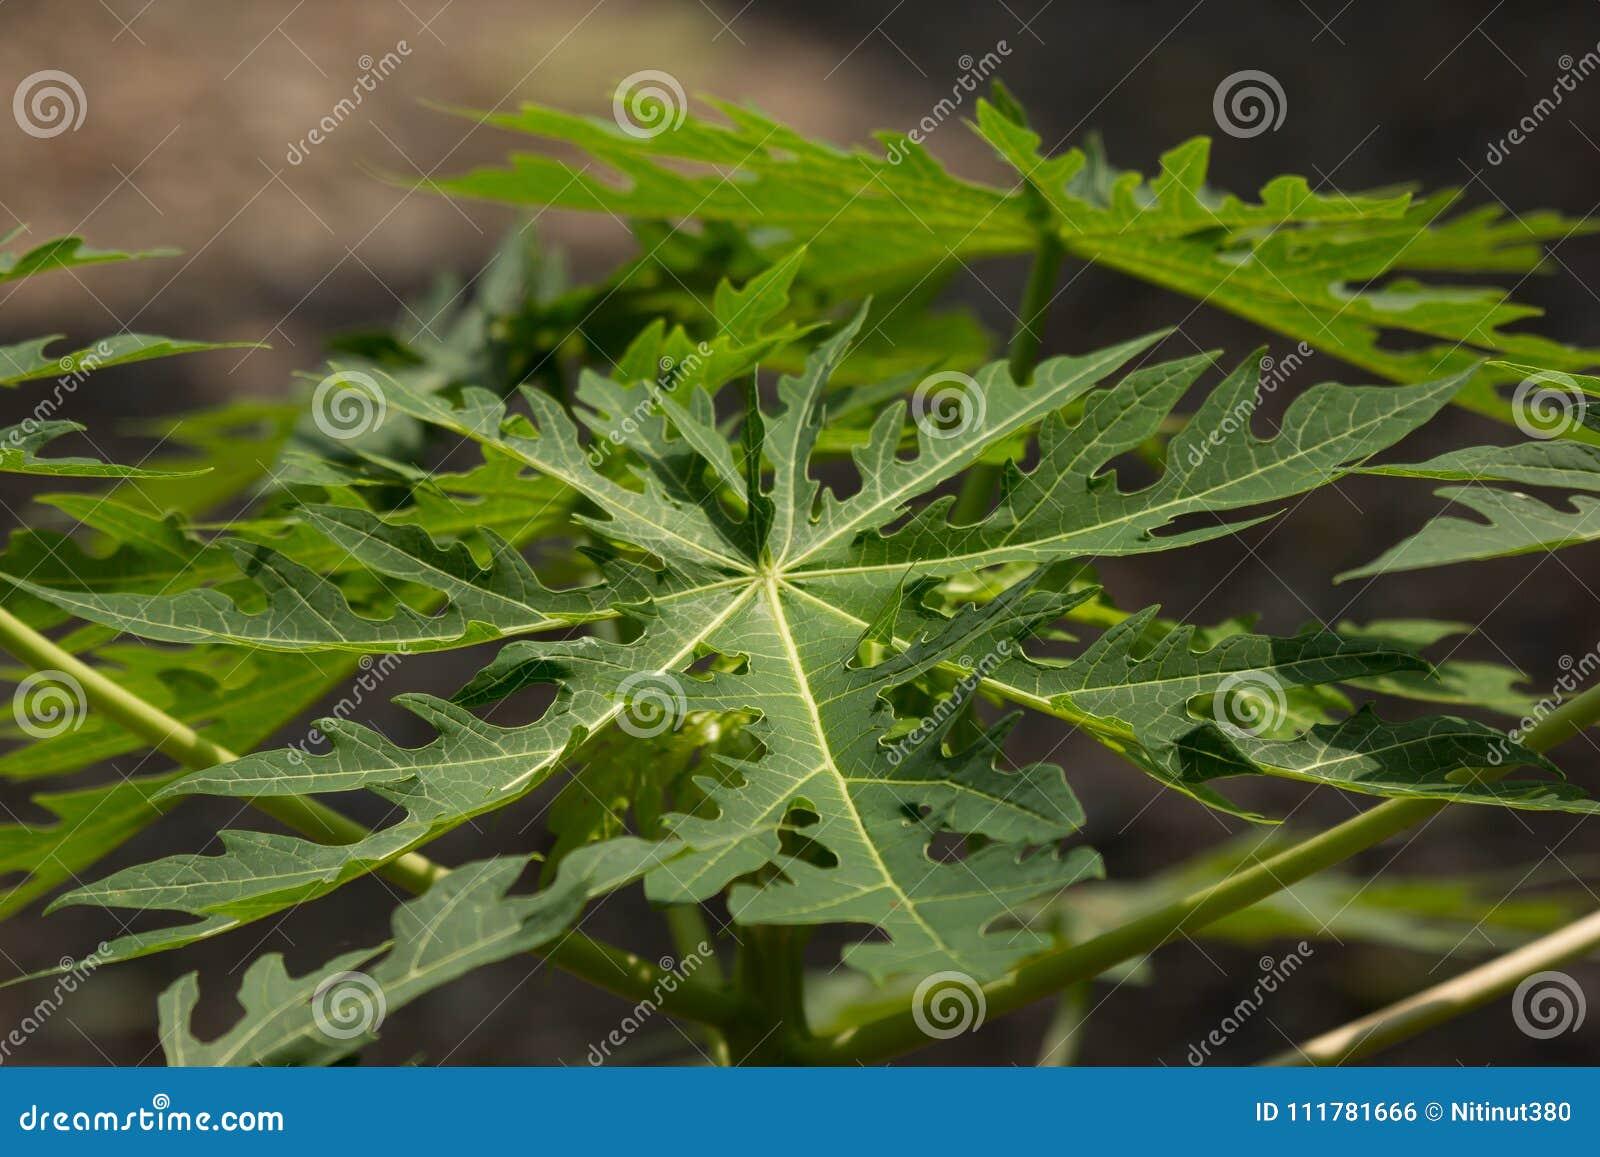 Green leaf of Young papaya tree